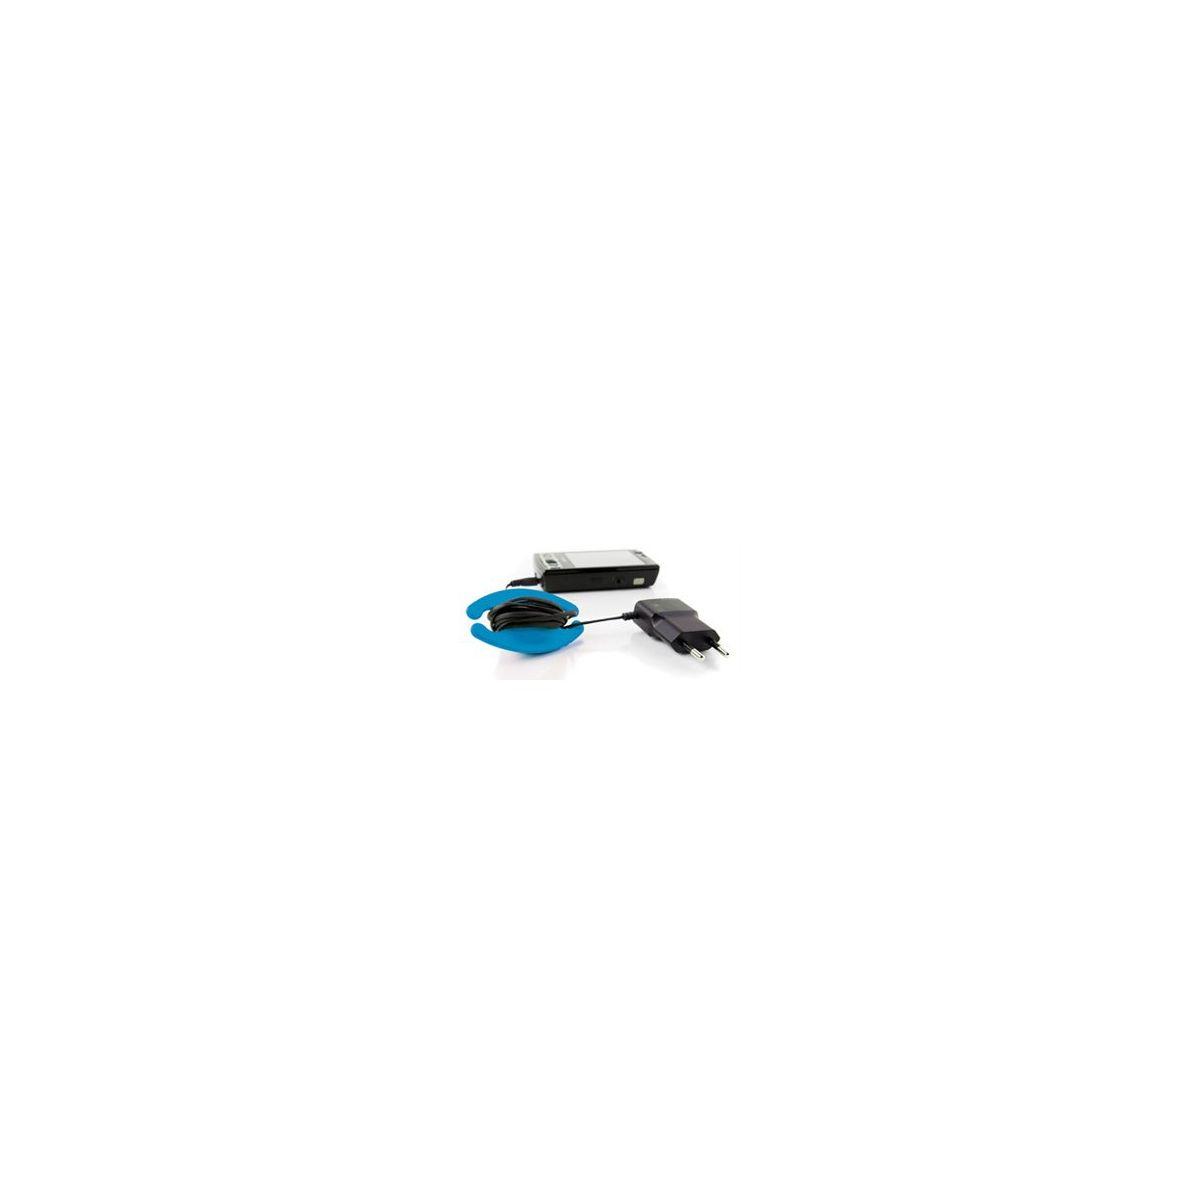 Serre-câble bobino enrouleur de cable m bleu (photo)